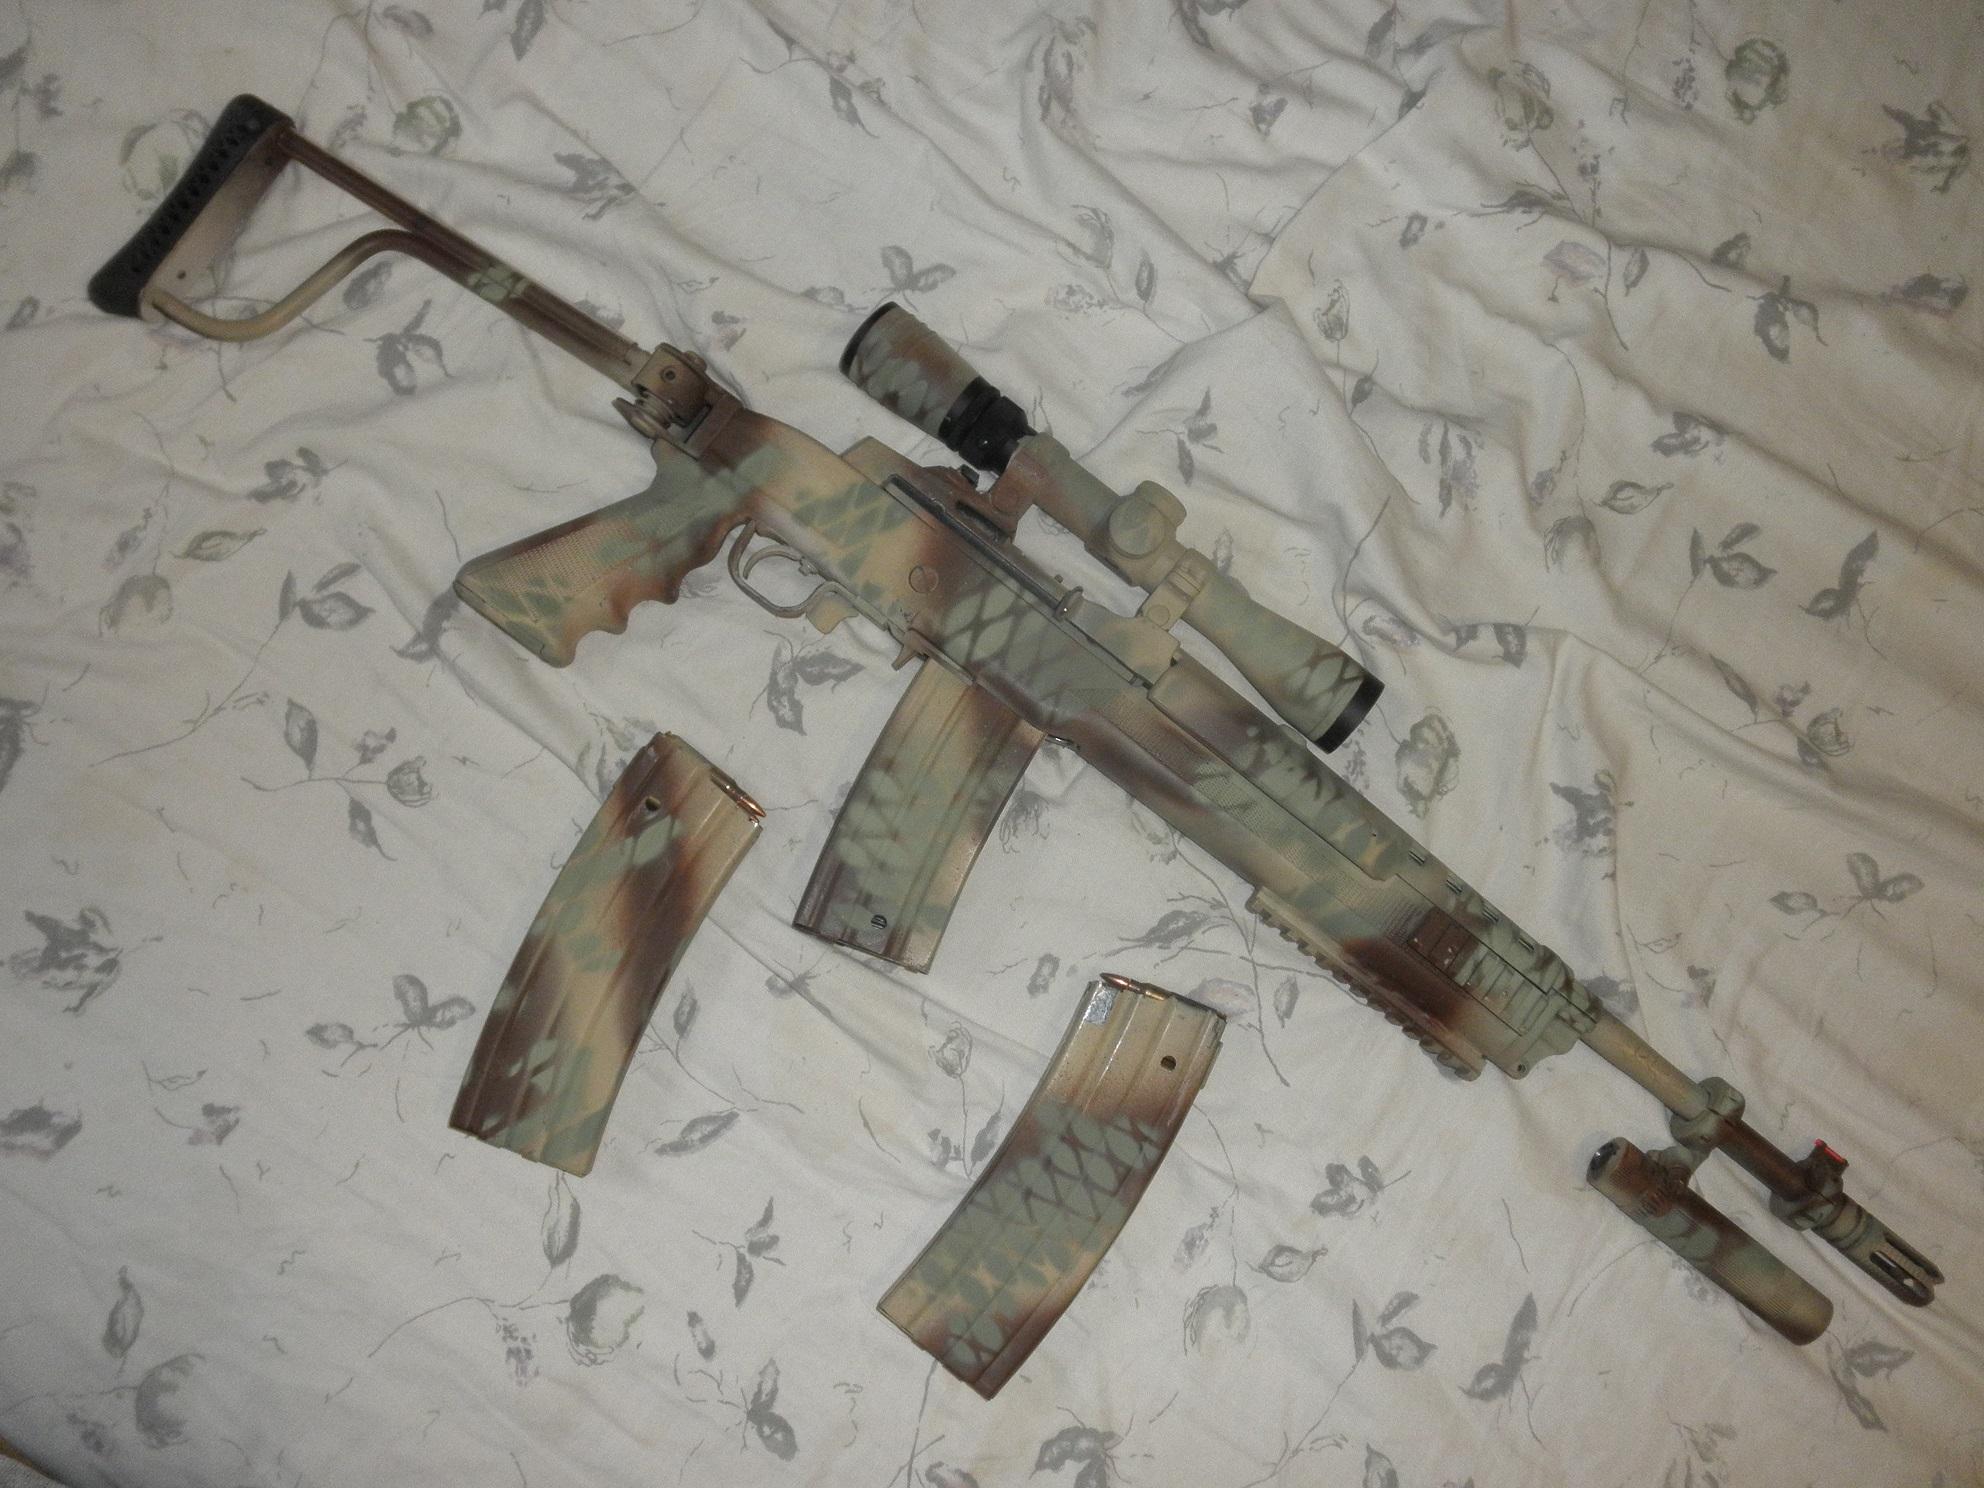 Painting Rifles - How To-mini.jpg